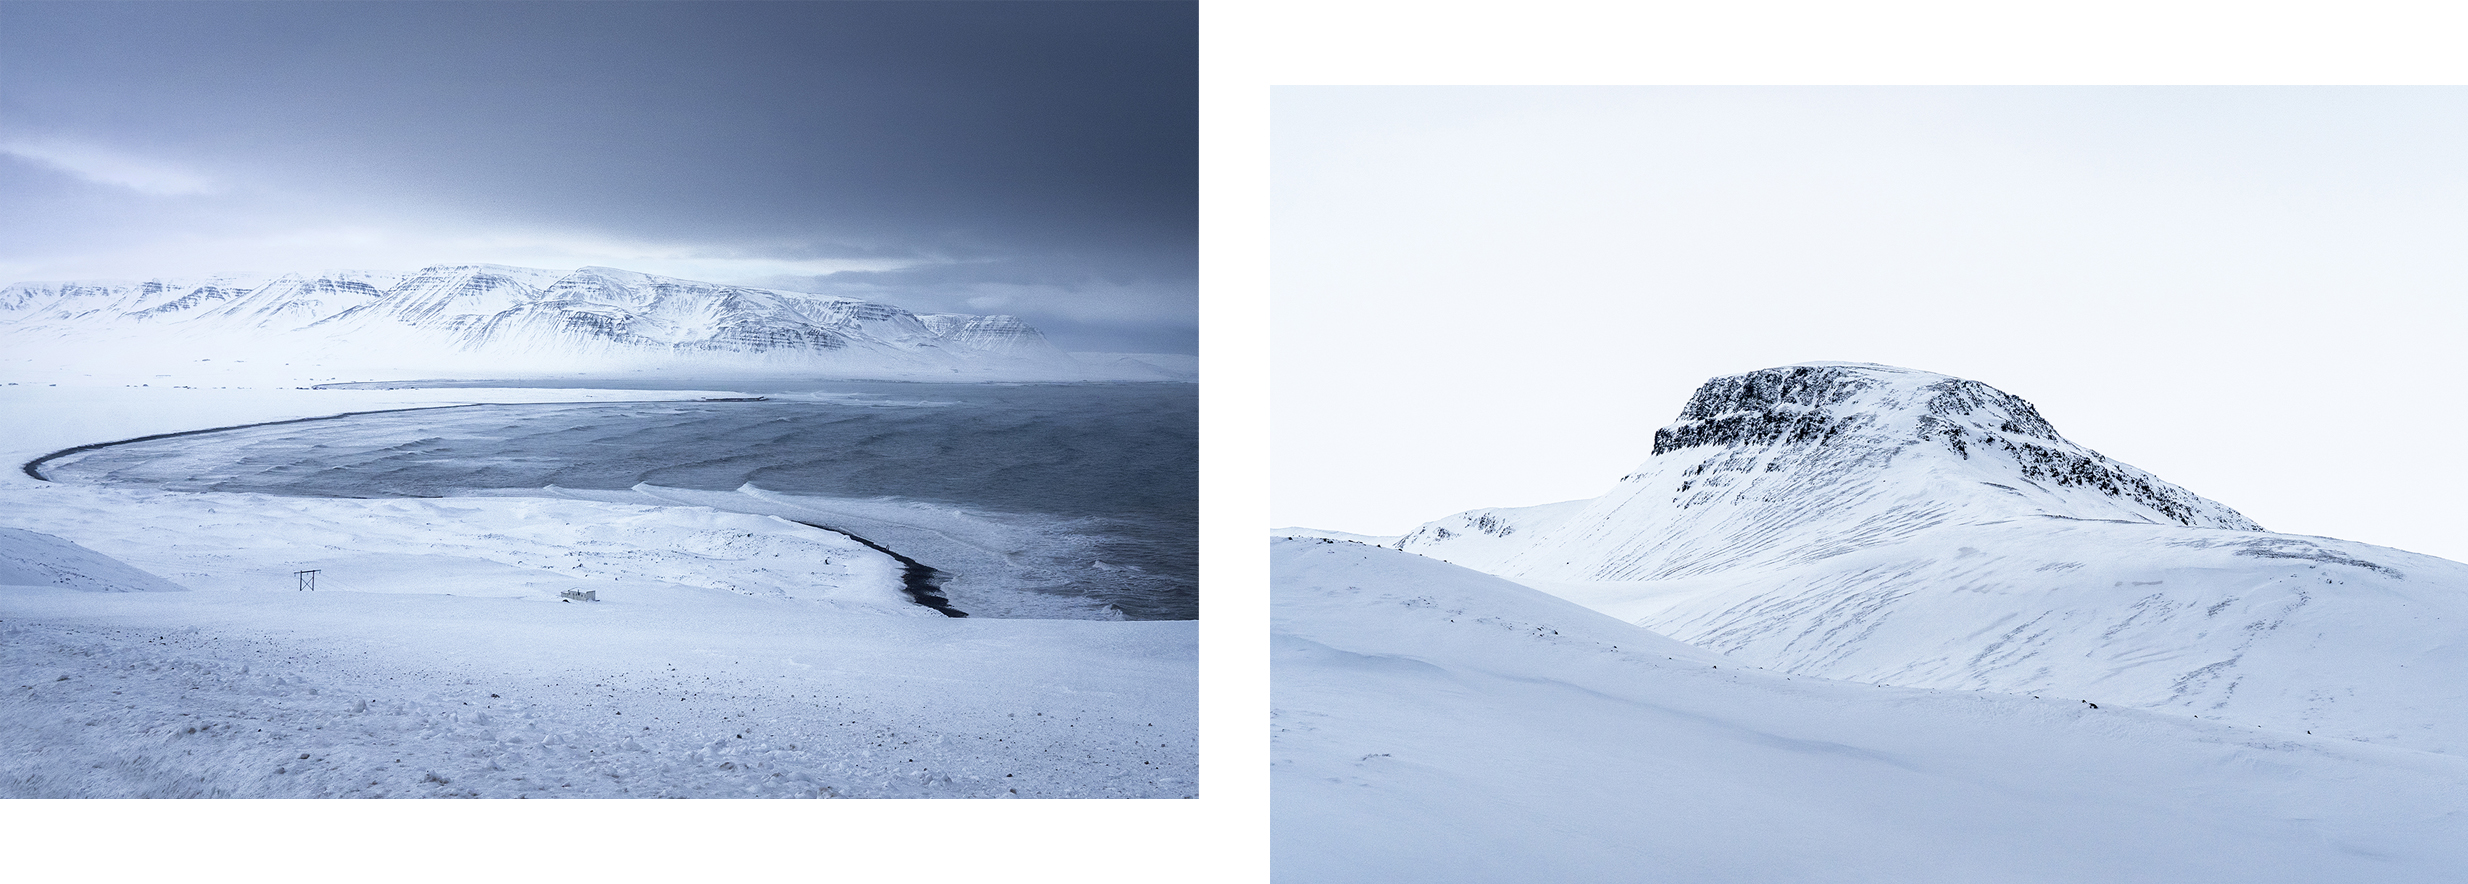 Tröllaskagi sommet neige ciel blanc et noir